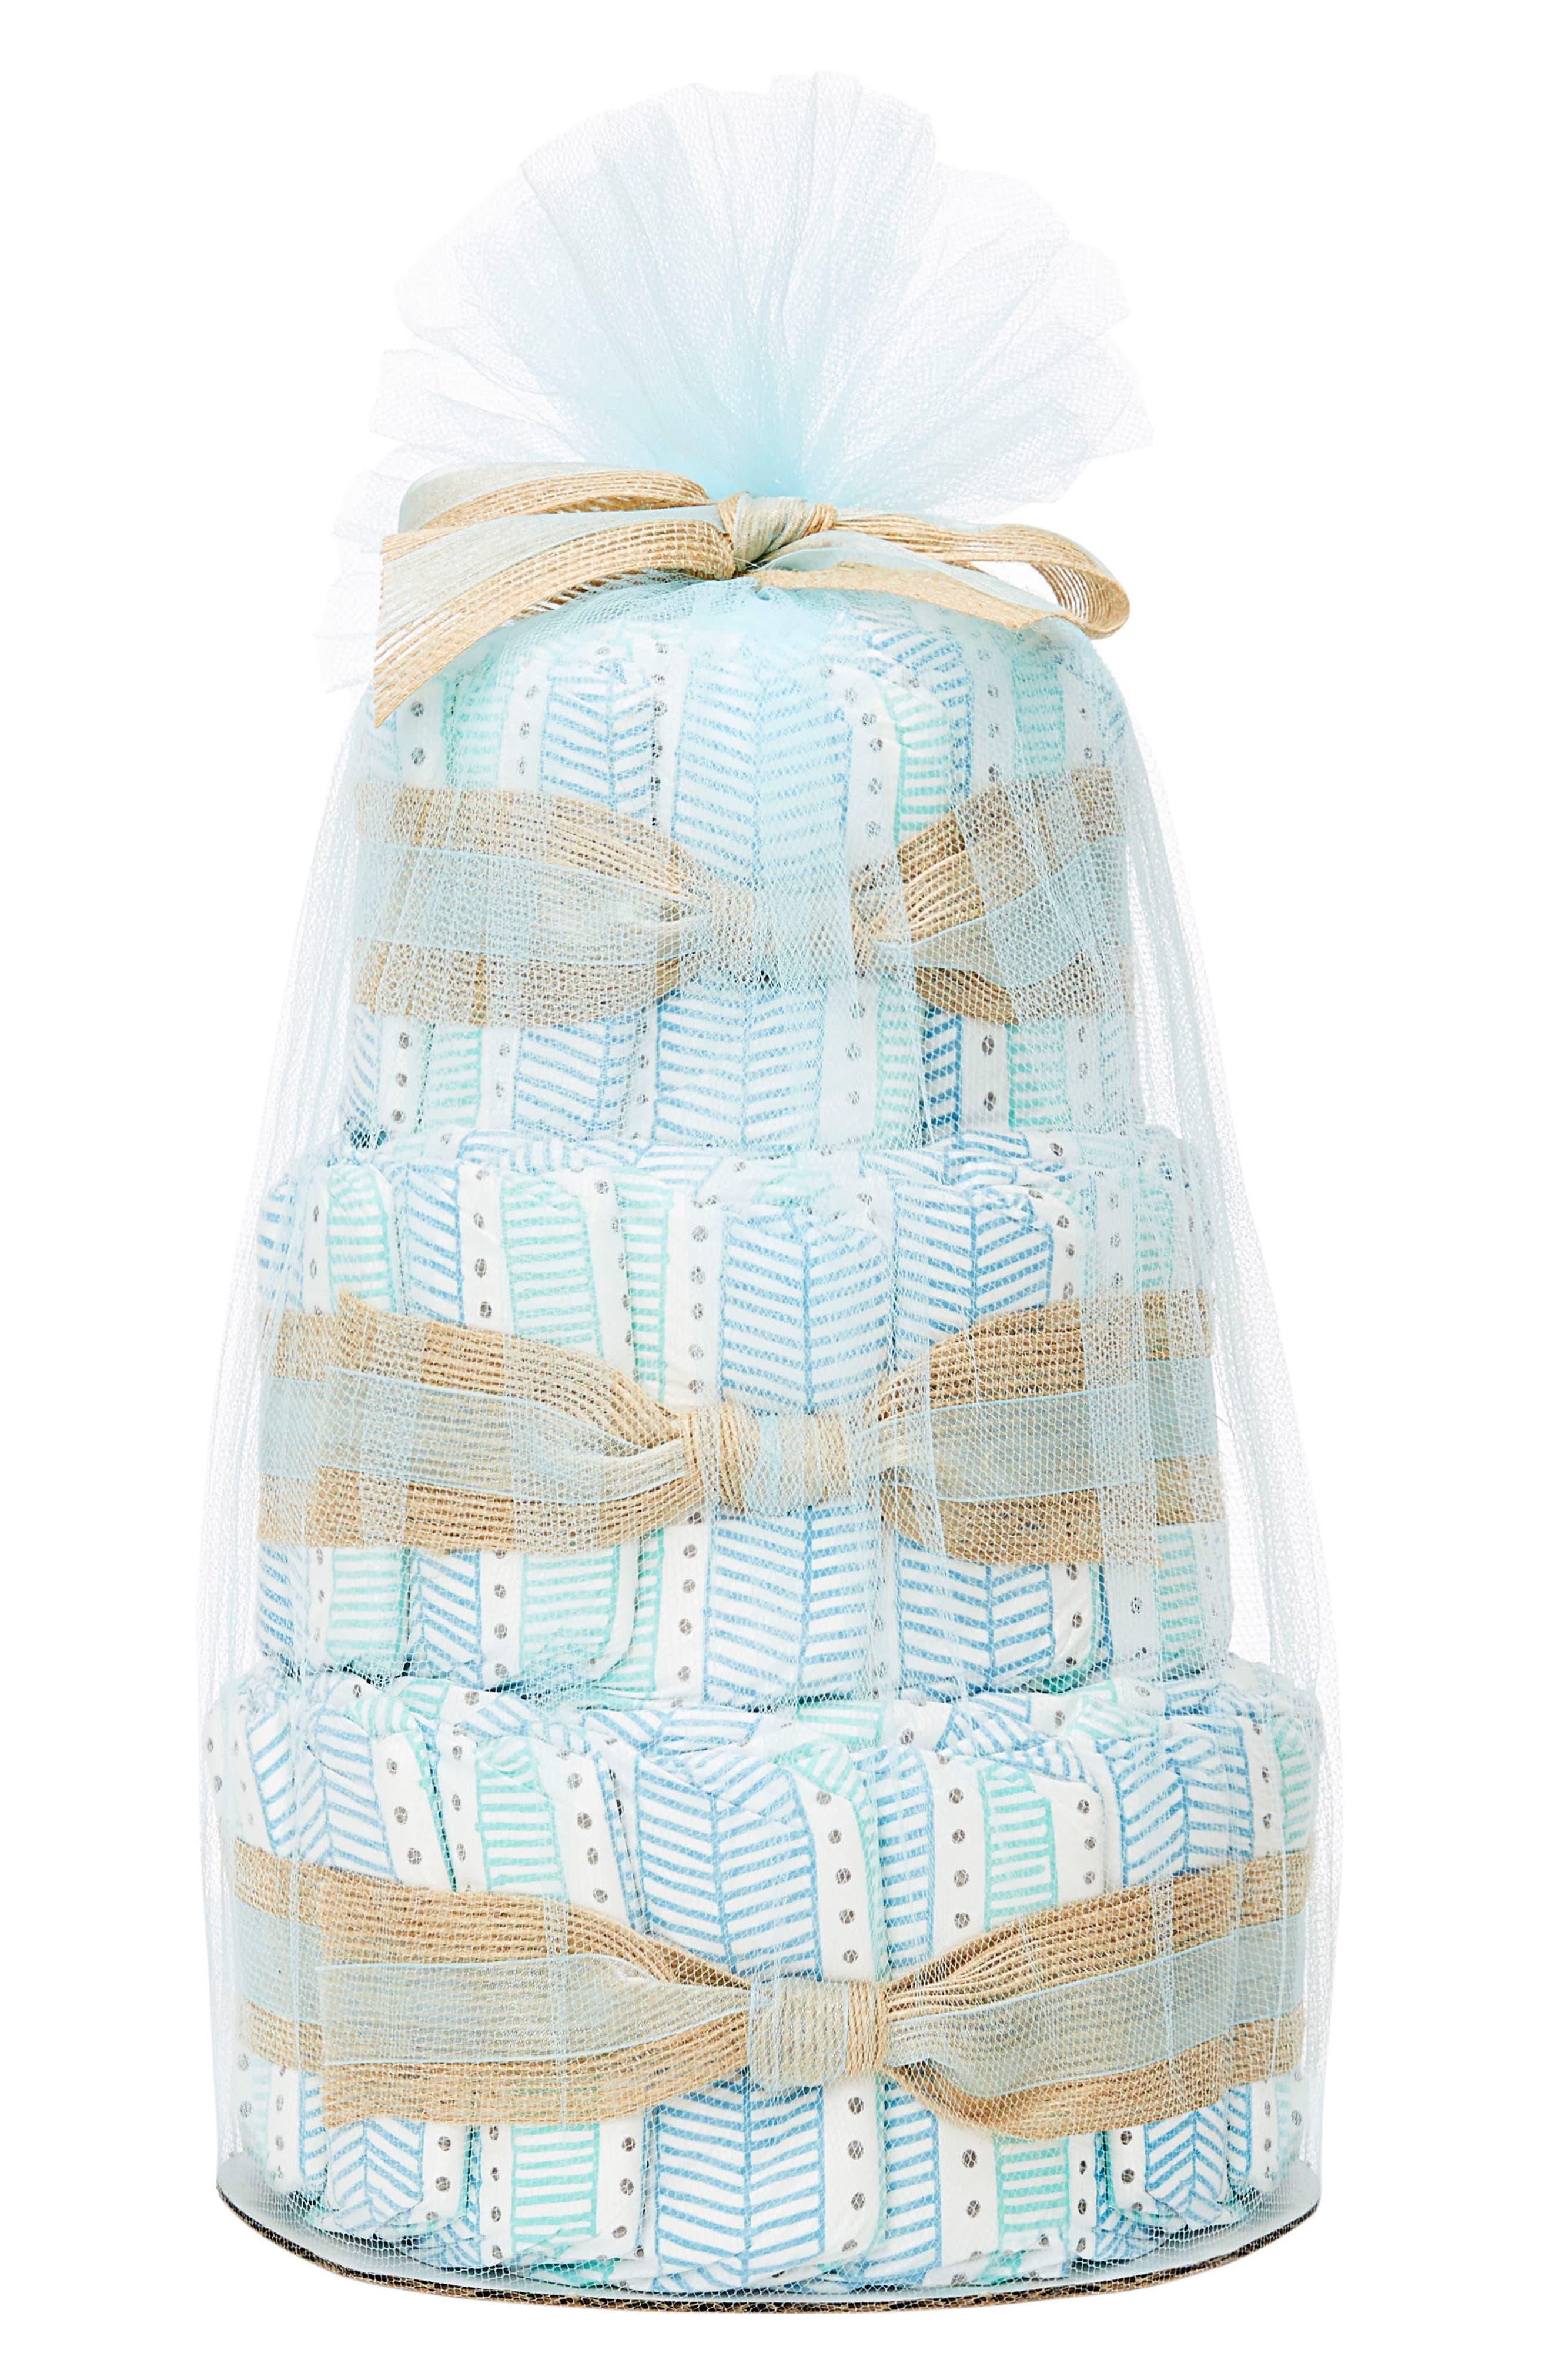 Main Image - The Honest Company Mini Diaper Cake & Travel-Size Essentials Set